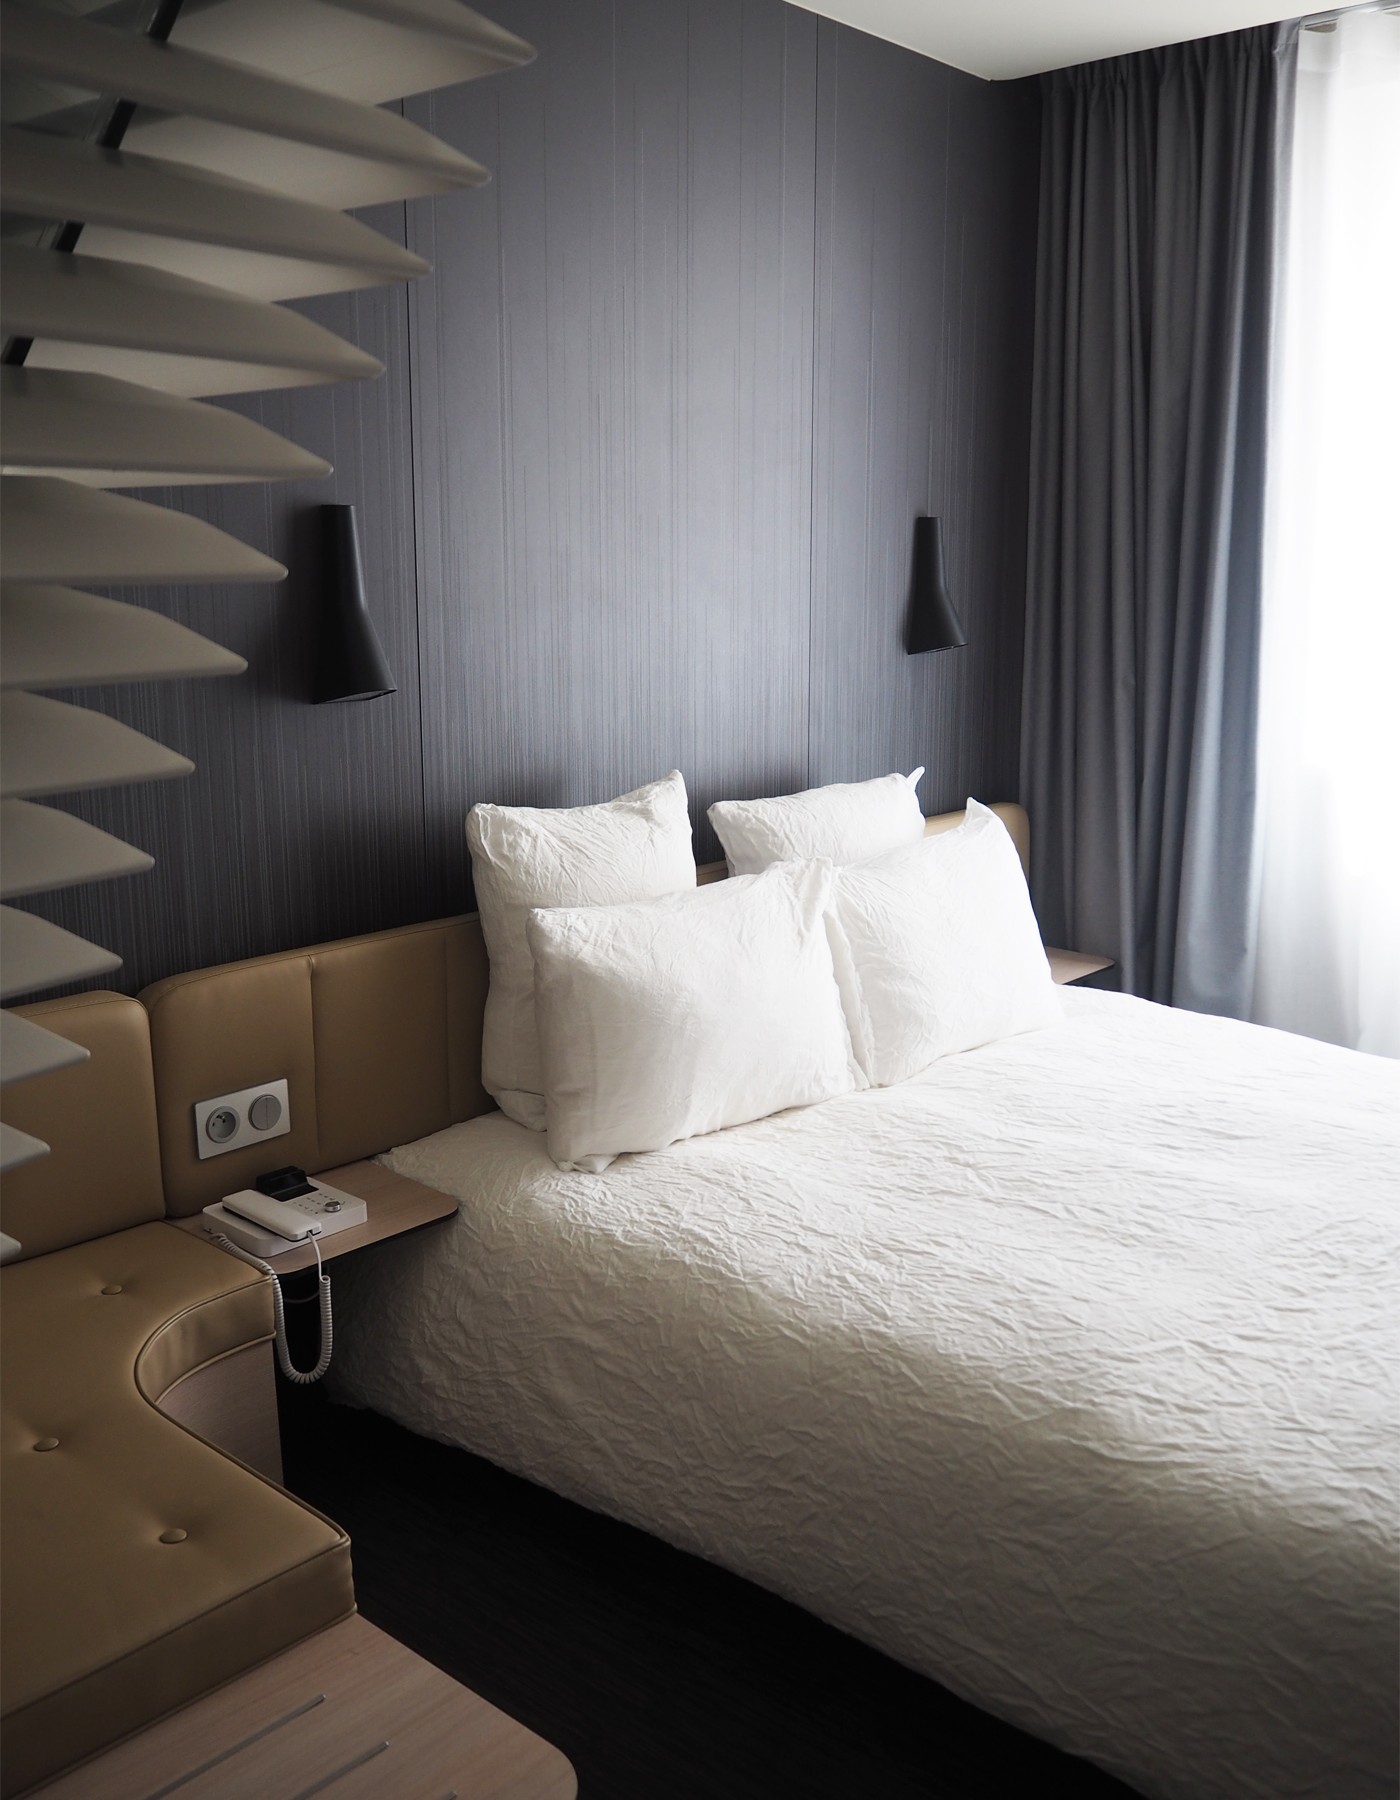 Okko hotel Cannes